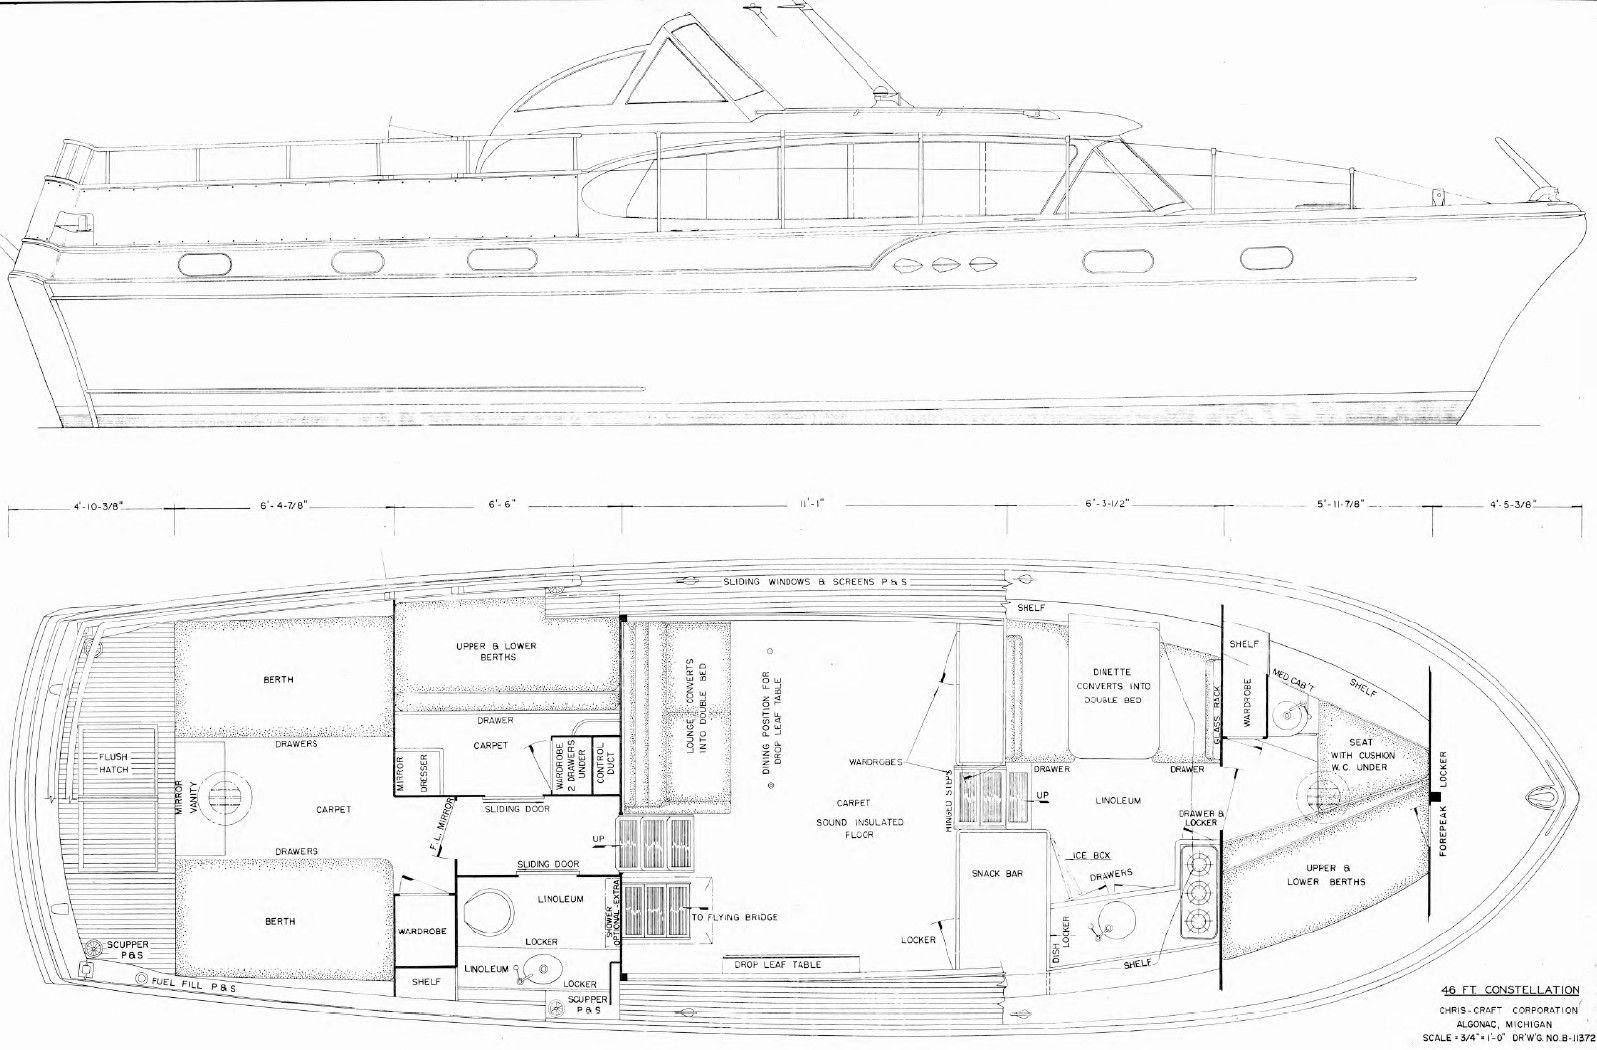 medium resolution of 1957 46 chris craft constellation plan drawing